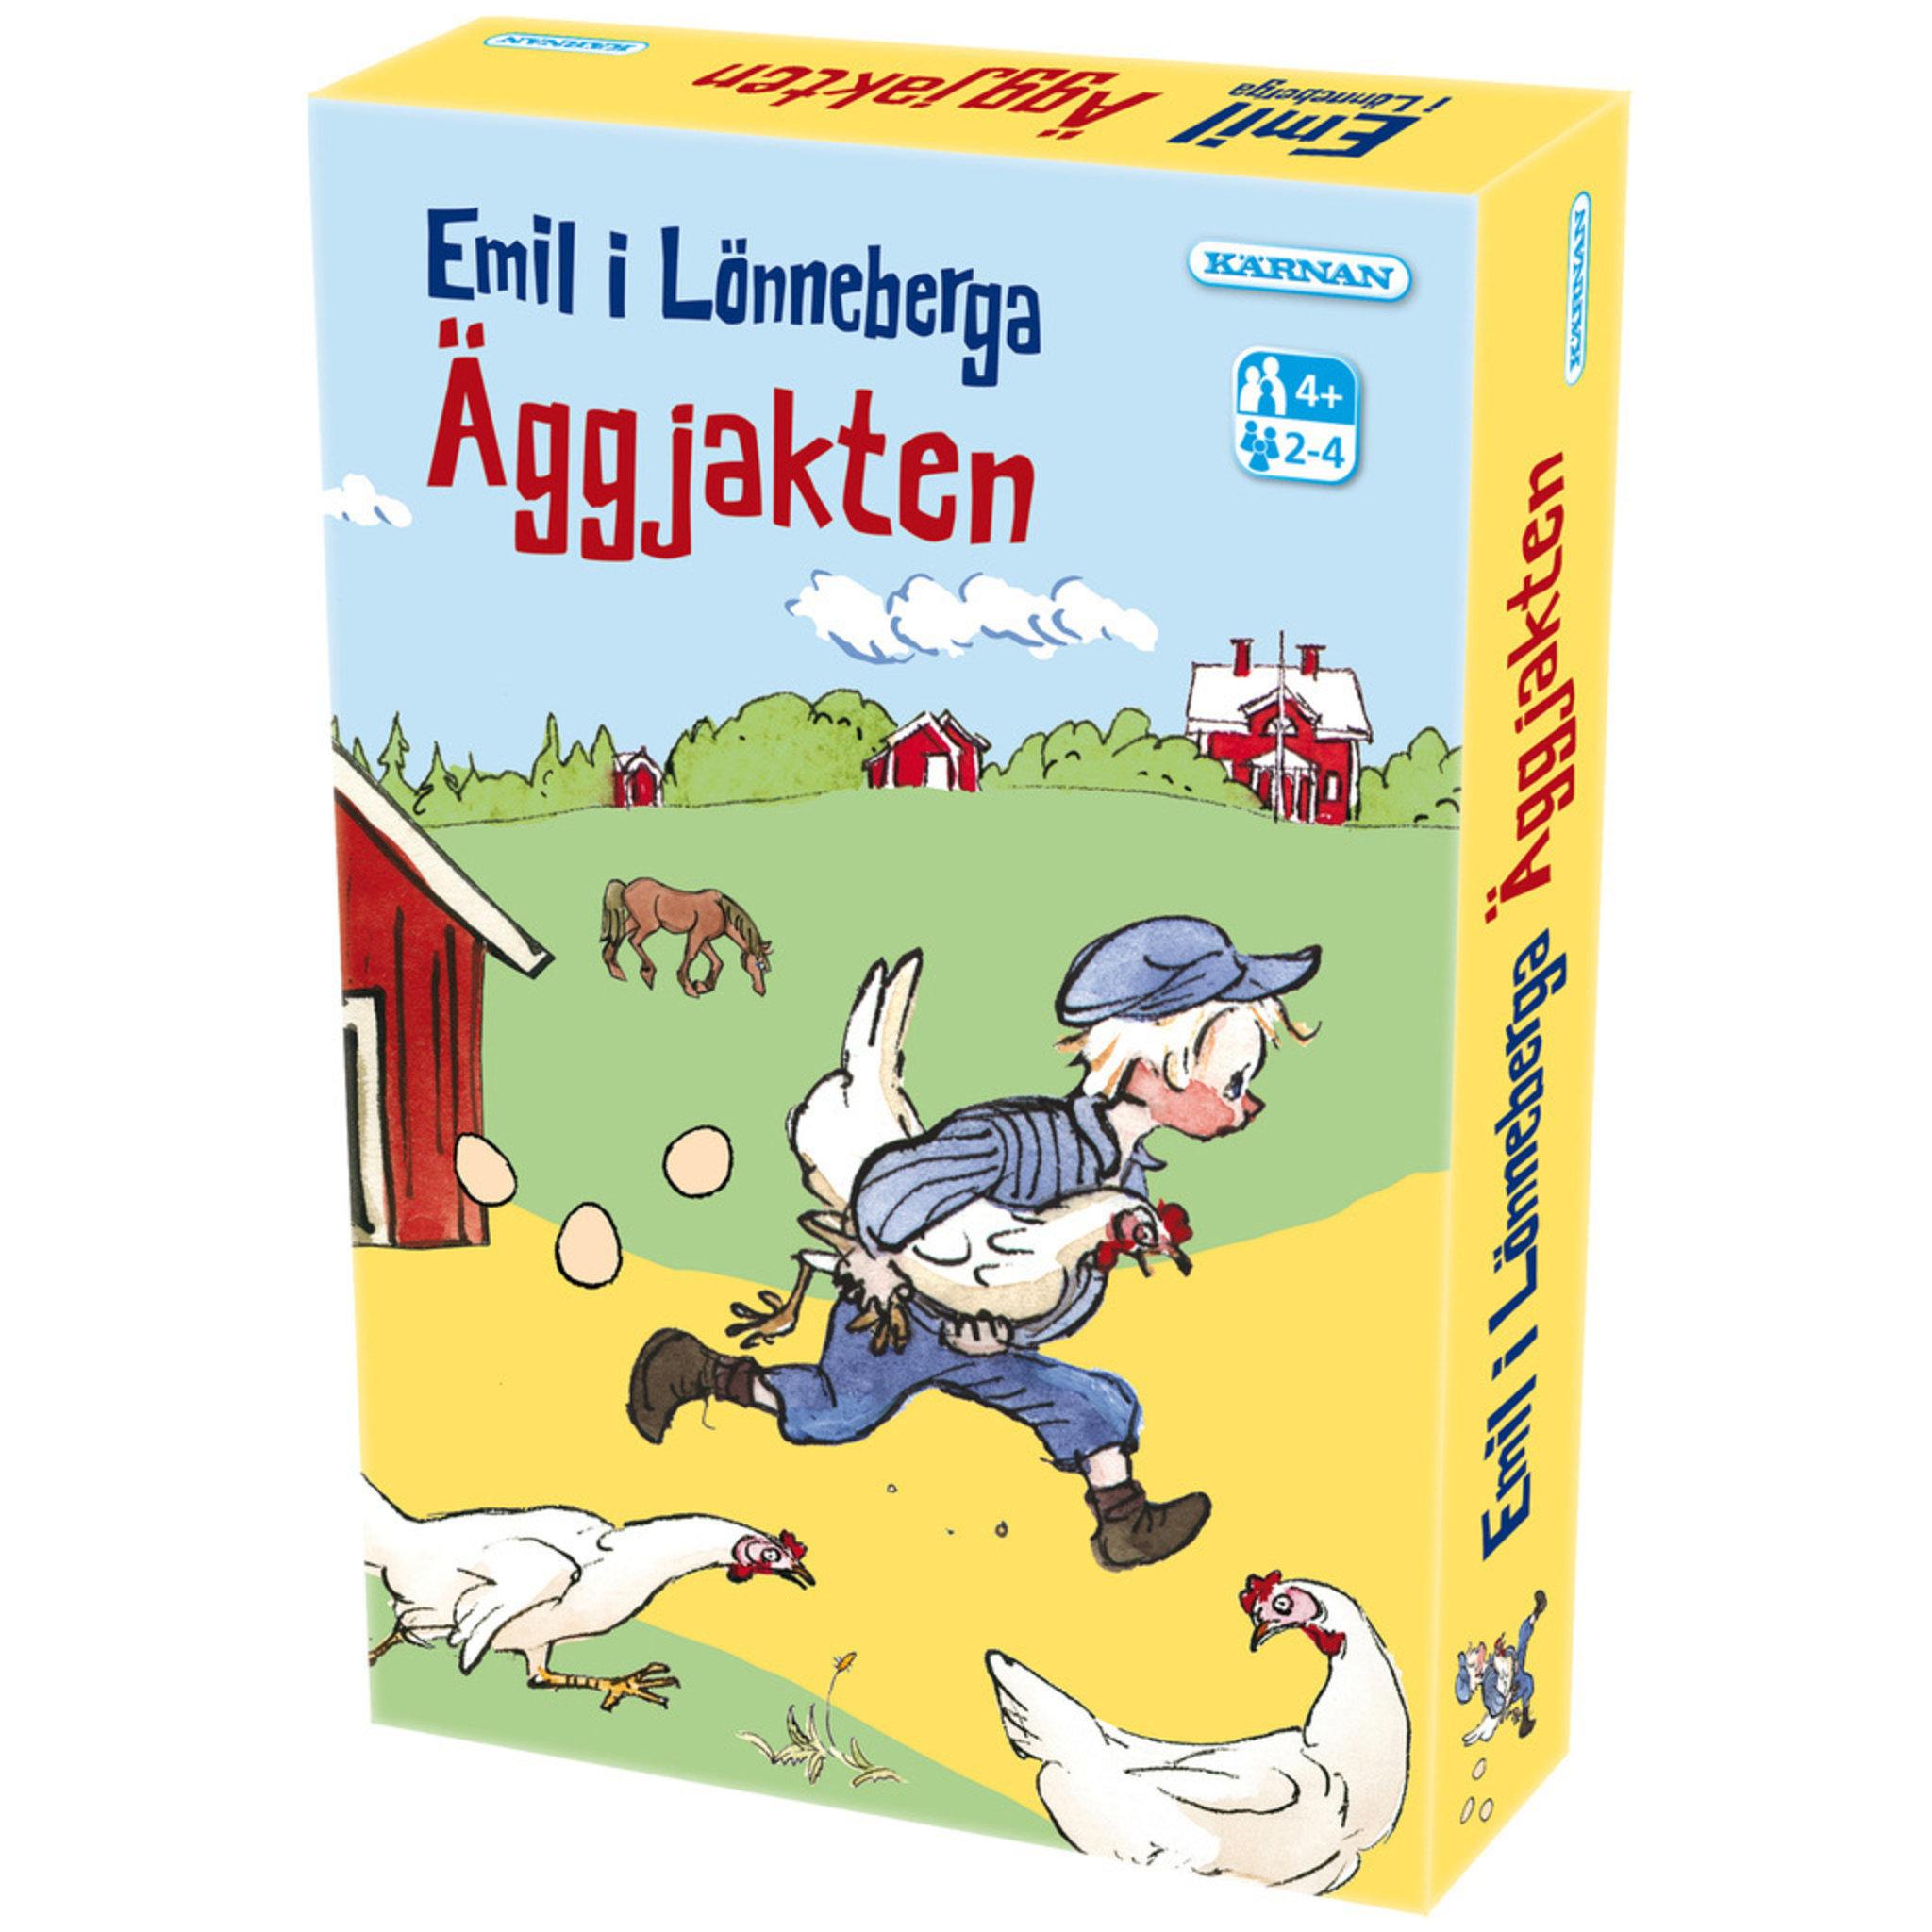 Äggjakten Emil i Lönneberga